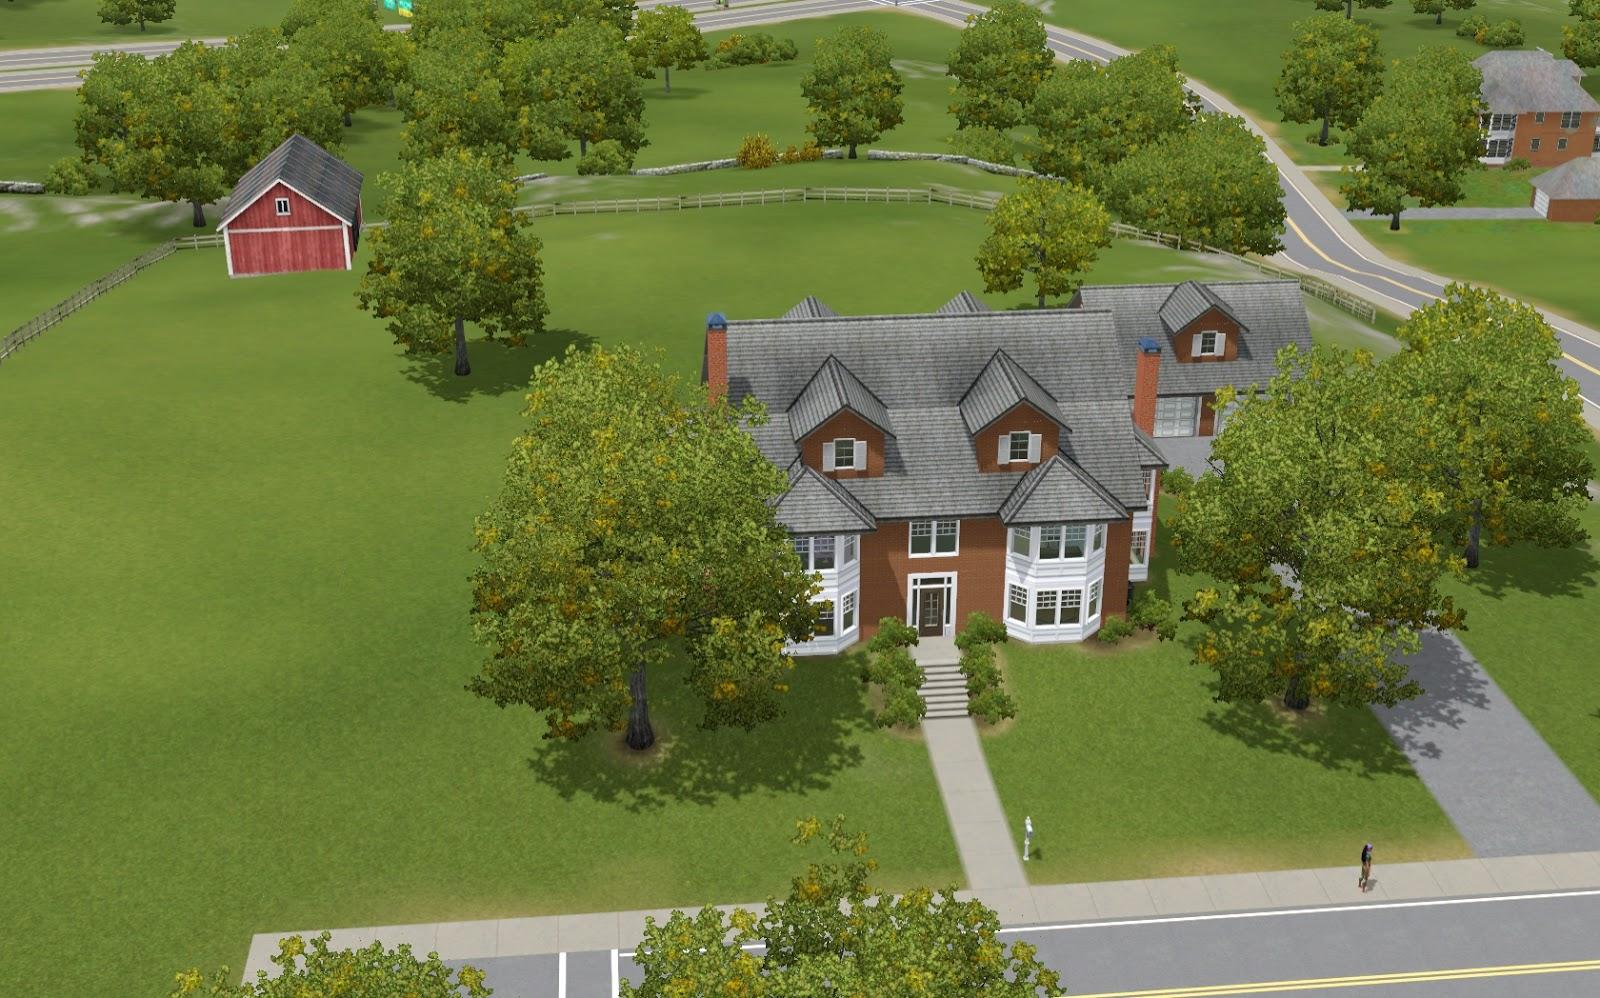 Summers Little Sims 3 Garden University The